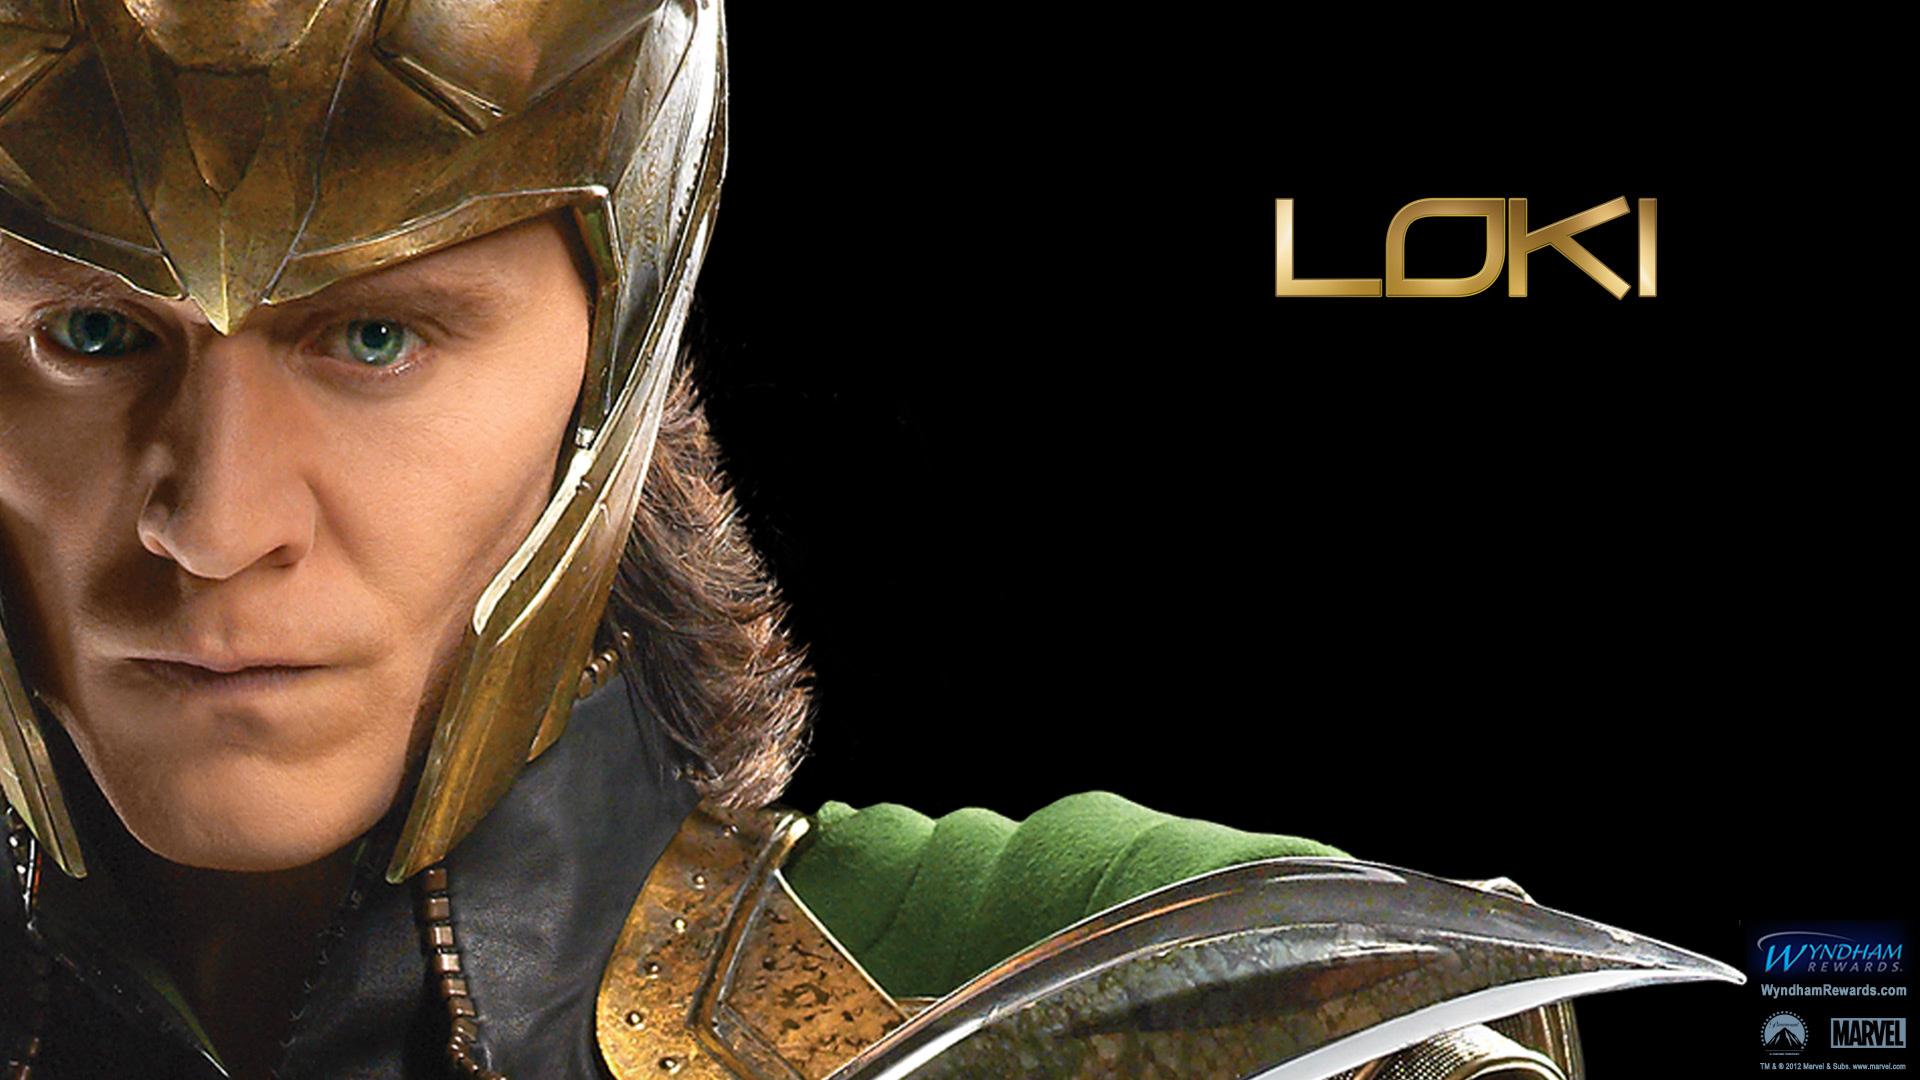 Loki wallpapers Loki background 1920x1080